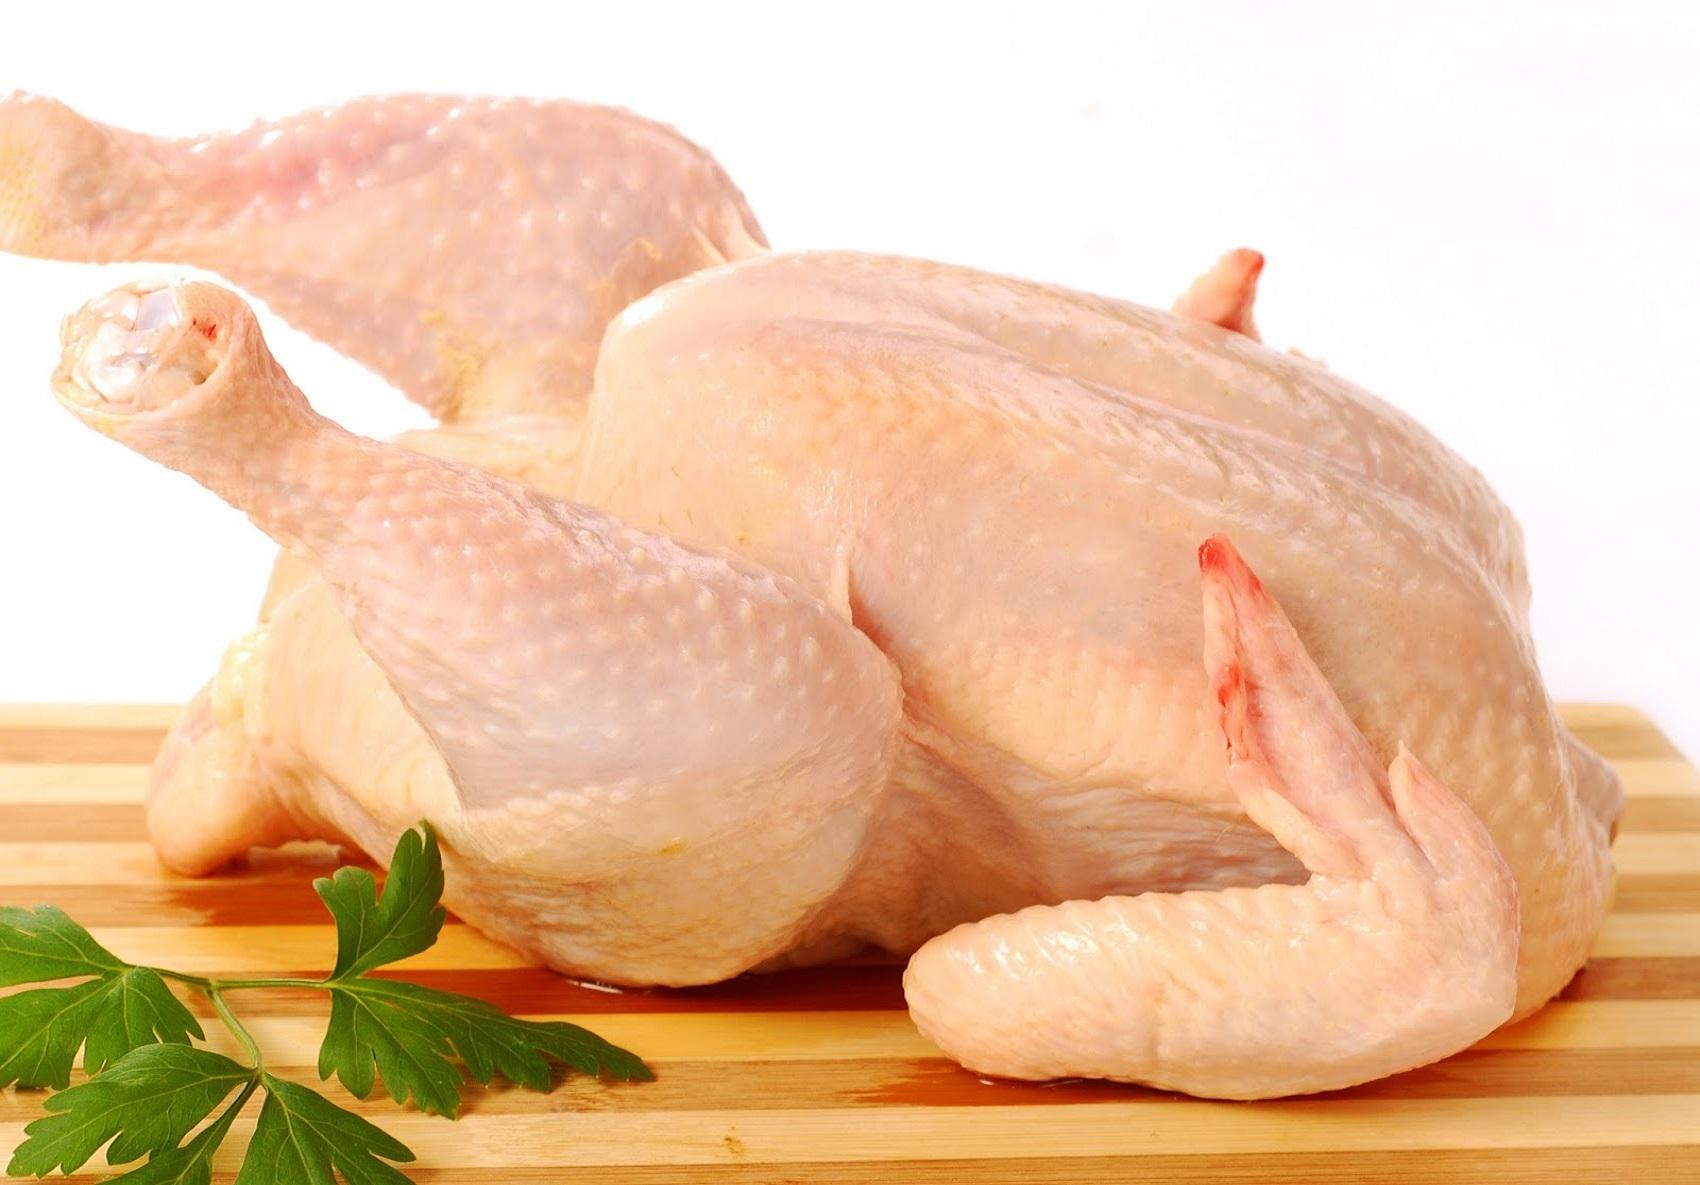 cara masak daging ayam giling